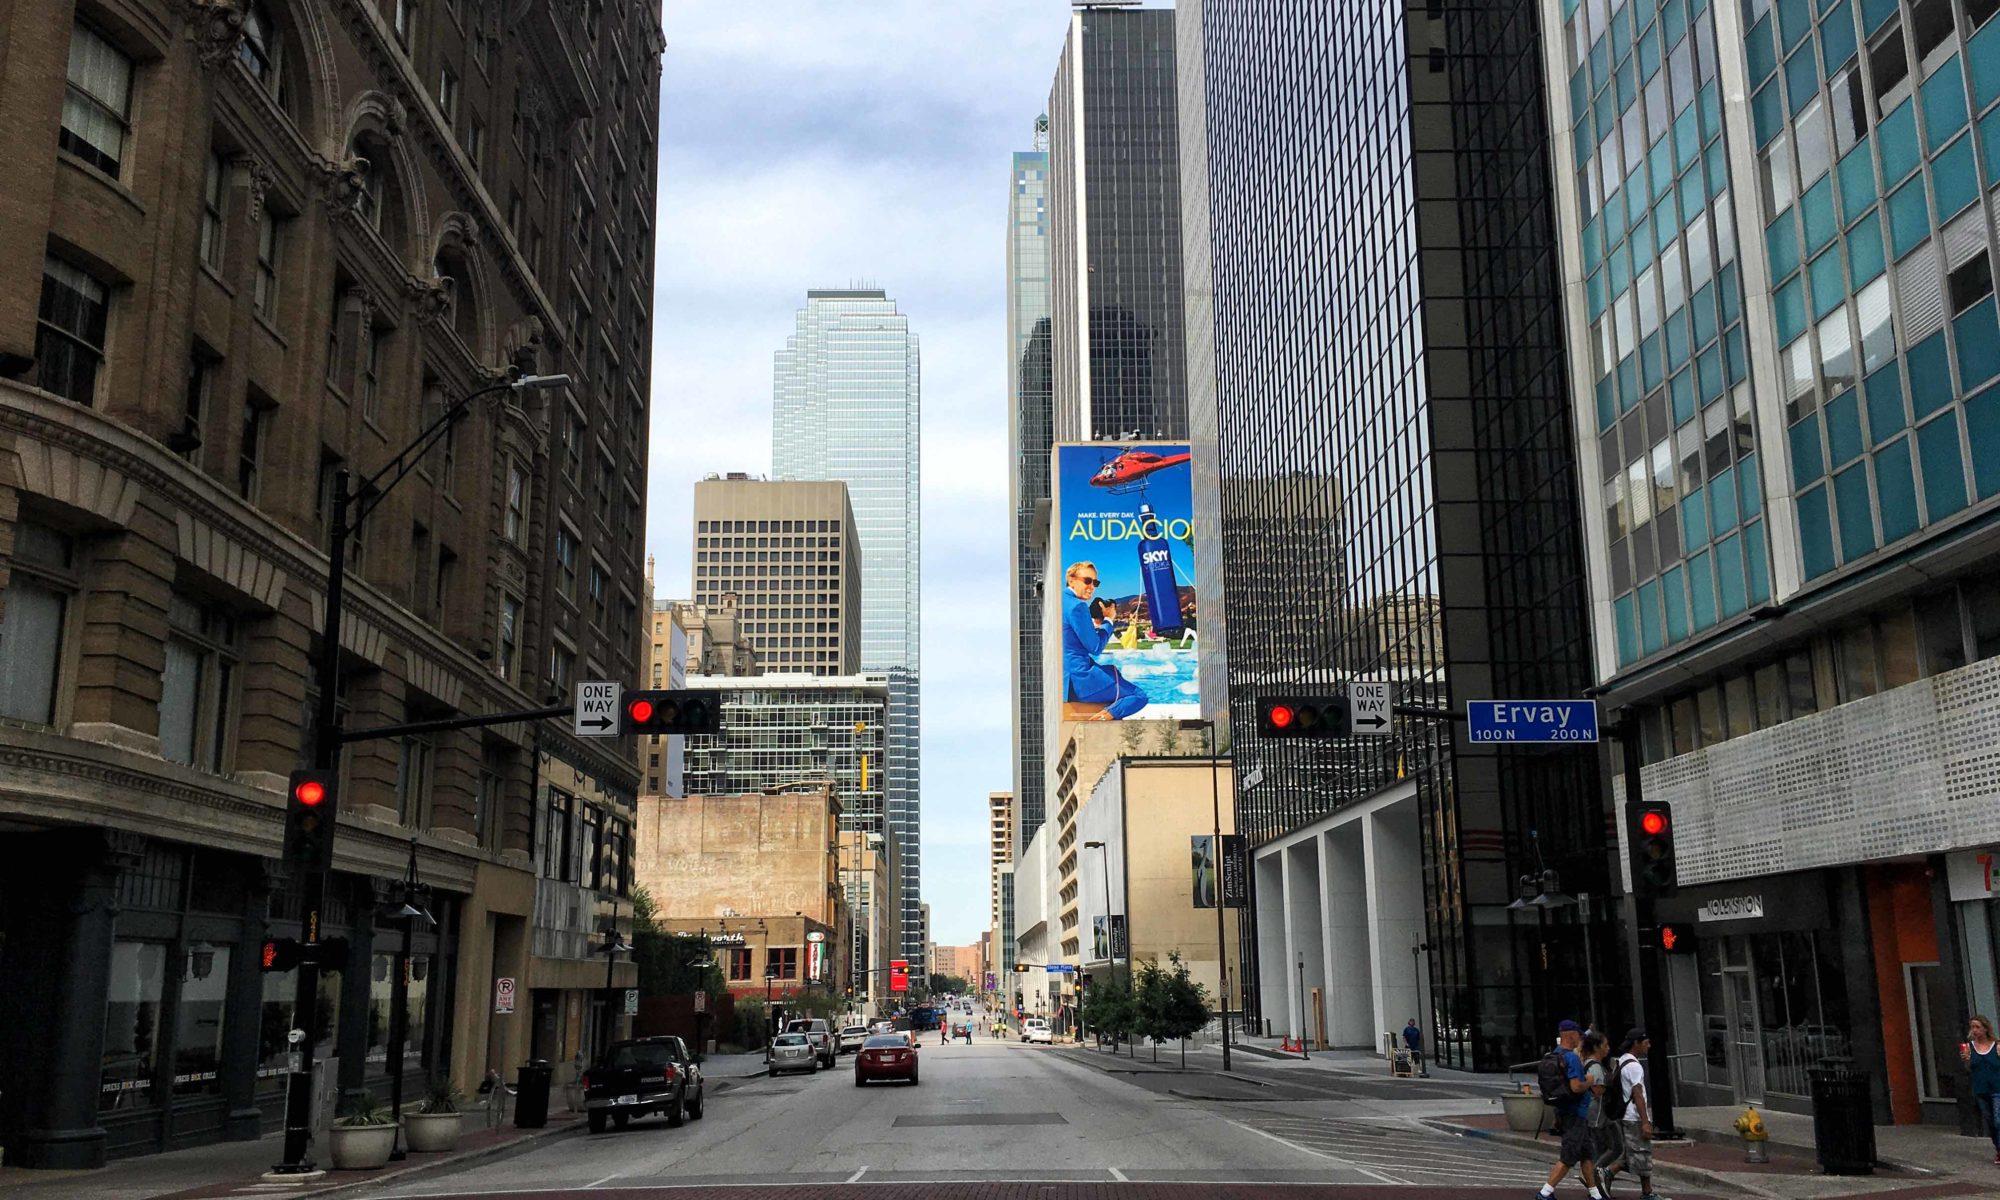 Downtown Dallas, TX - © TsWISsTER